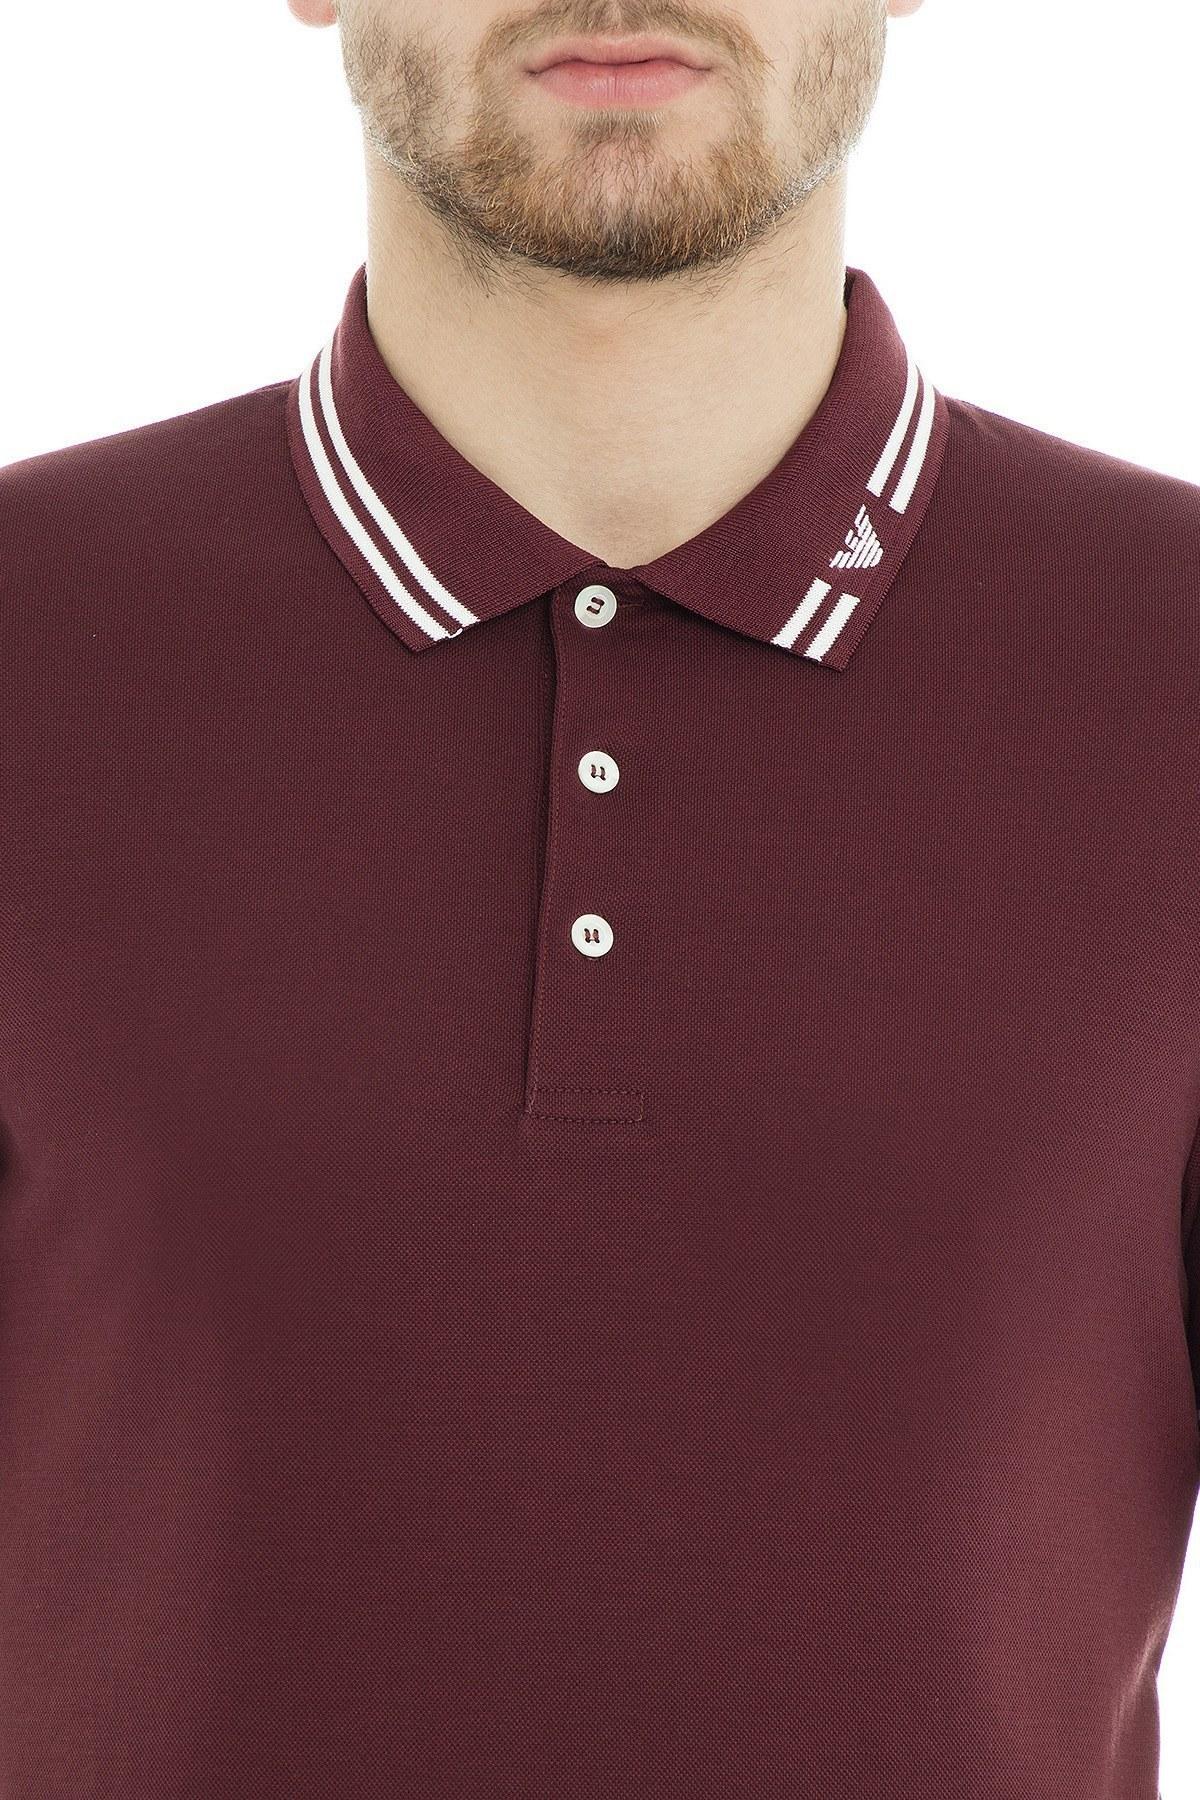 Emporio Armani Polo Erkek T Shirt 3G1FL0 1JBQZ 0347 BORDO